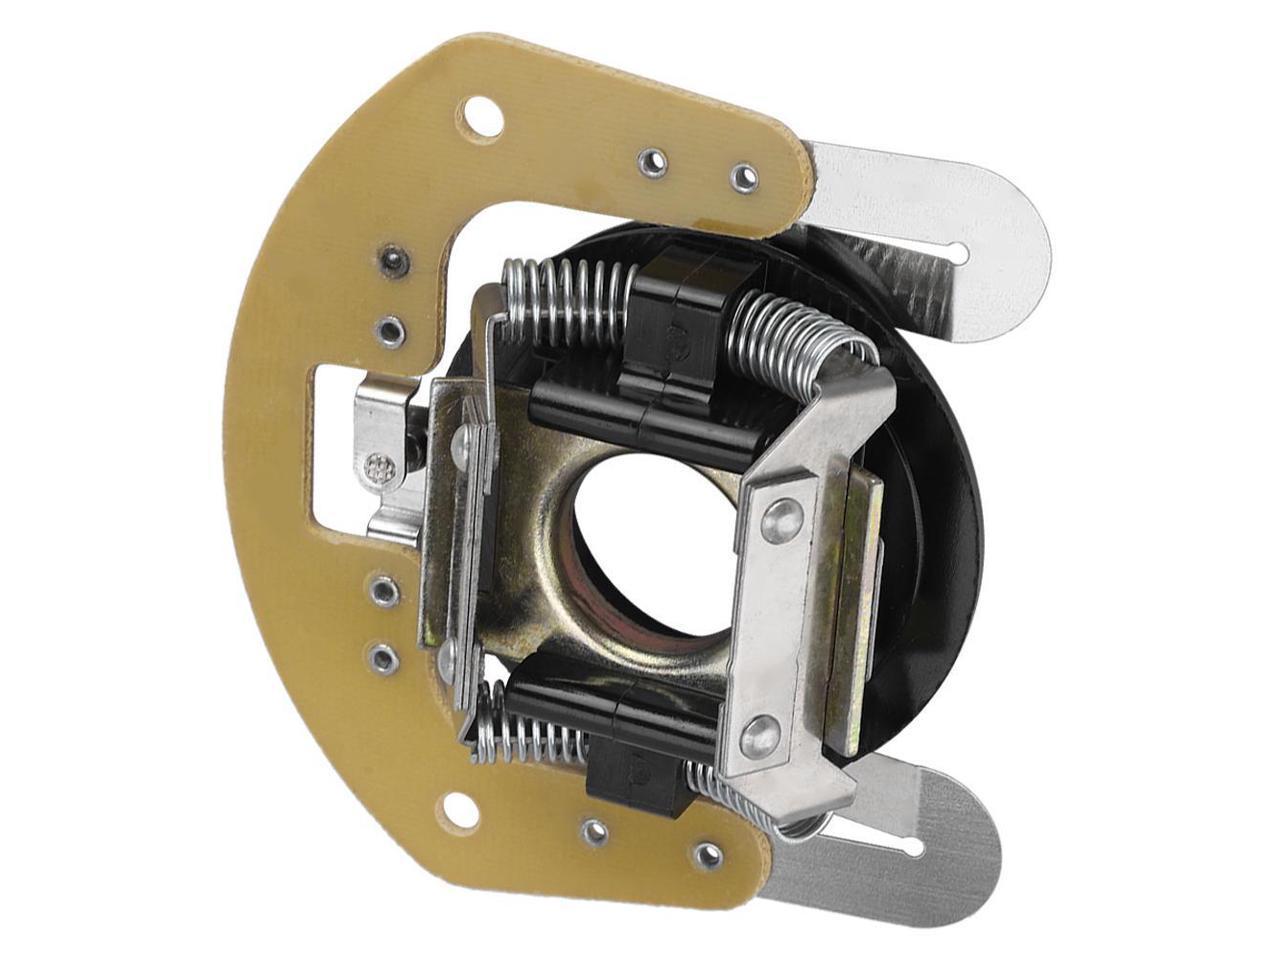 1PCS 030 Micro Motor Small Fan Motor micro Electric Fan Massager Shaver Motor